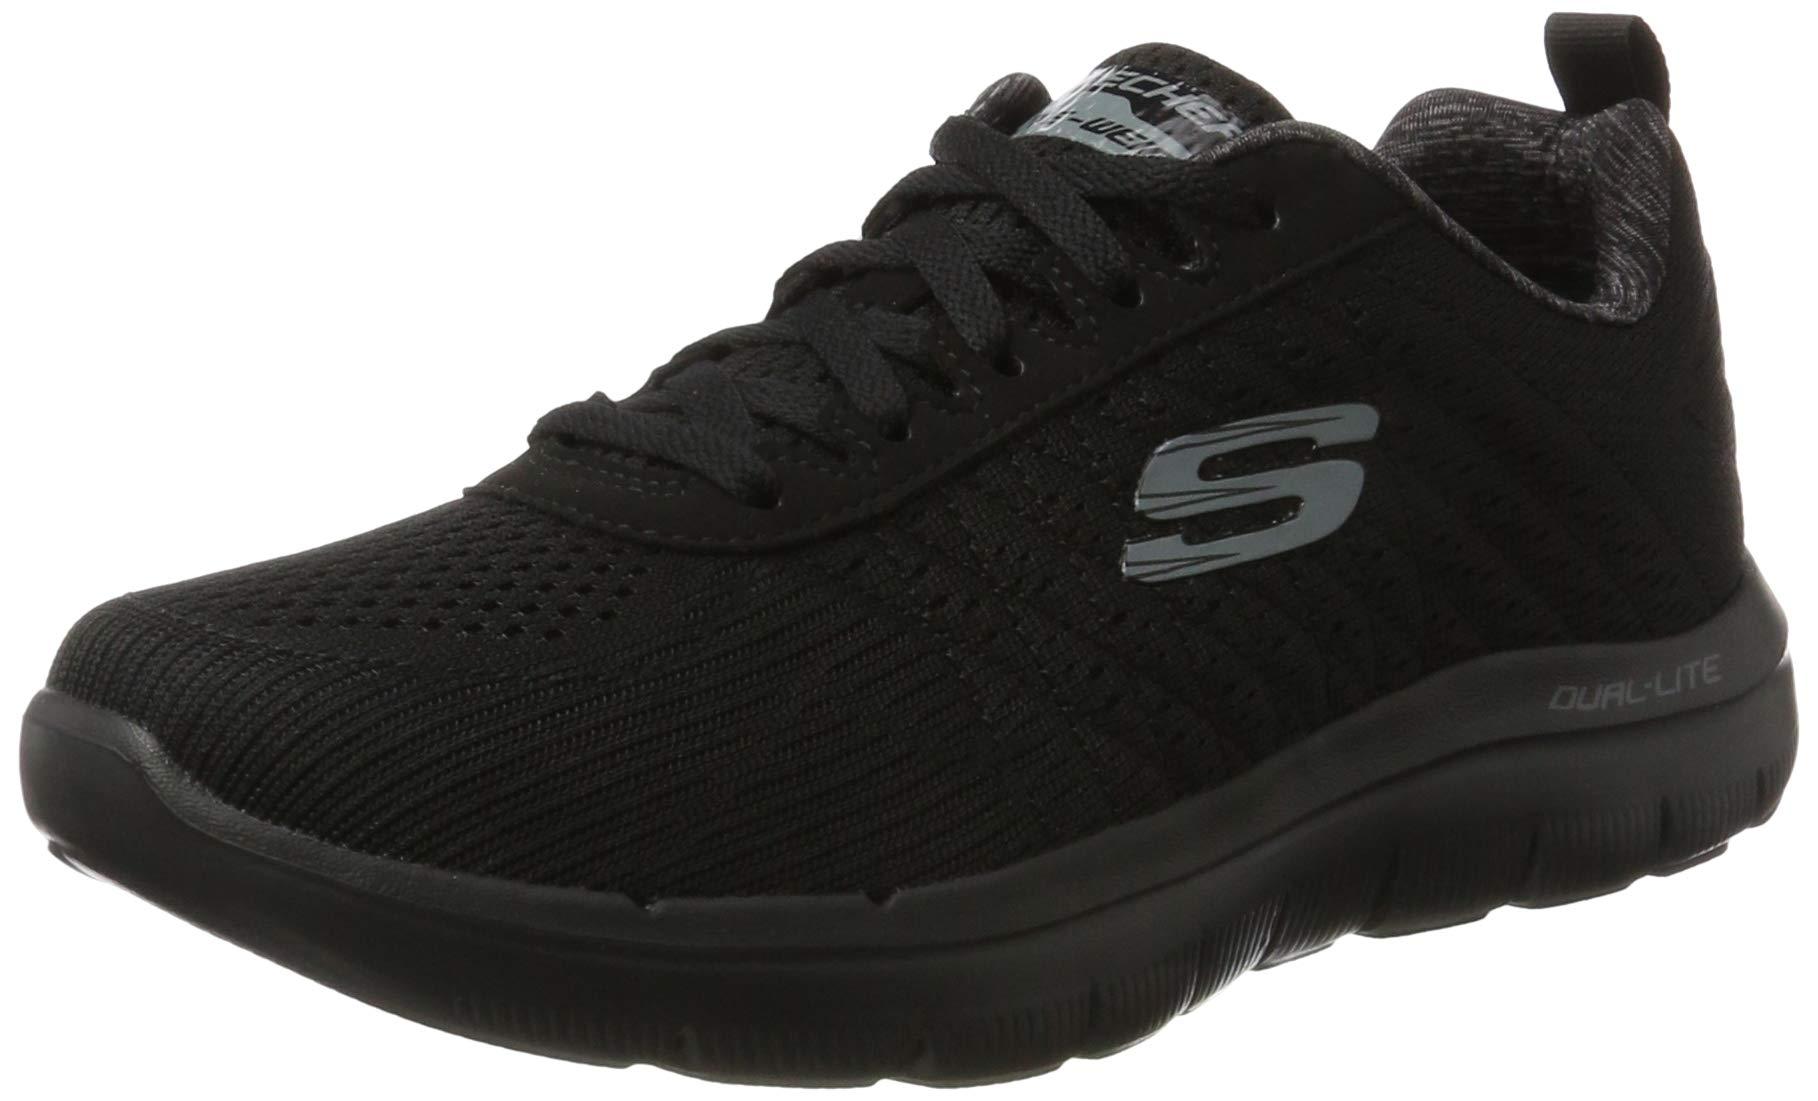 Skechers Flex Advantage 2.0 The Happs Mens Sneakers